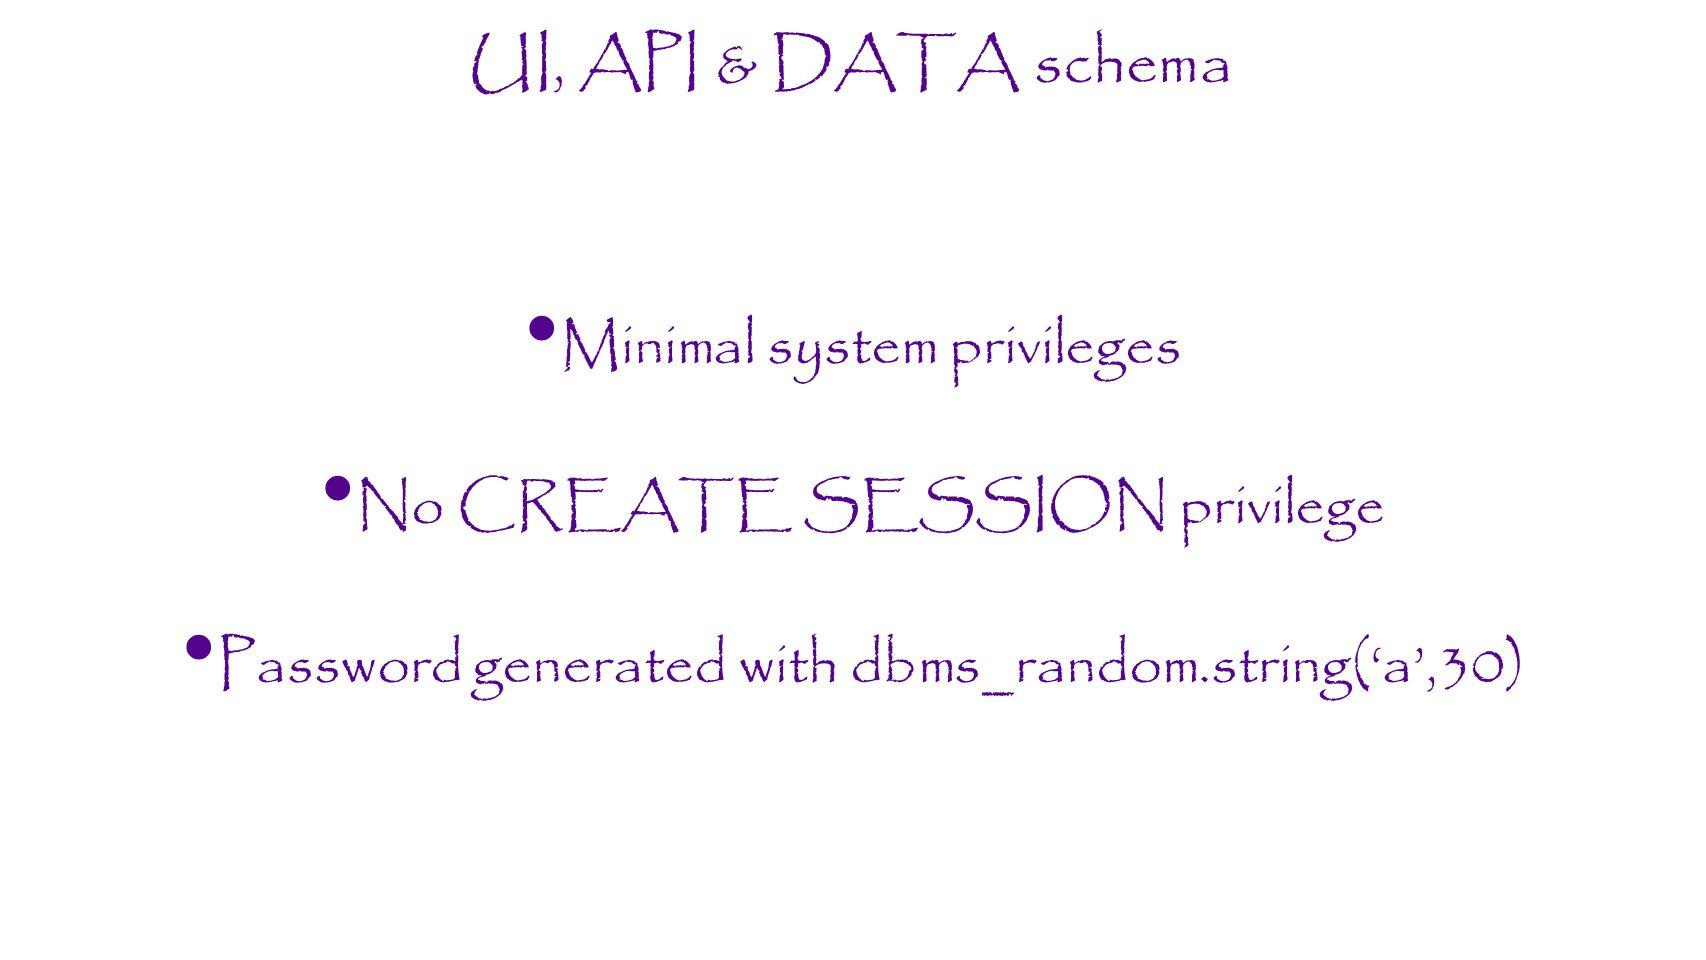 UI, API & DATA schema Minimal system privileges